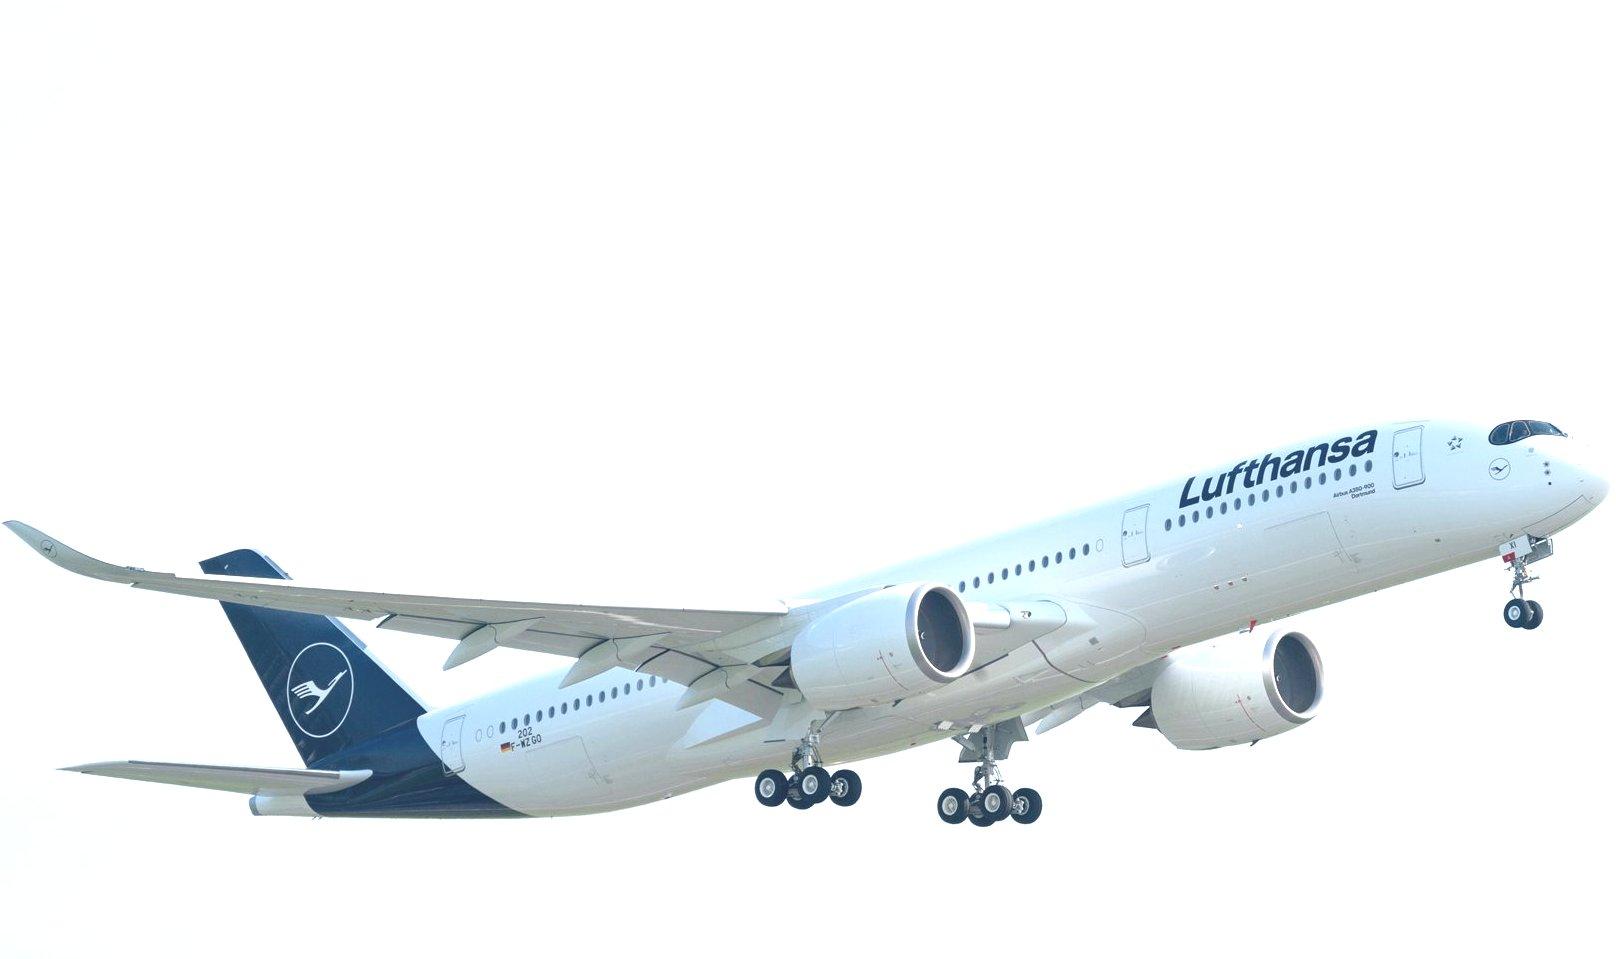 AW-Airbus.com_A350-900-Lufthansa-MSN202-take-off